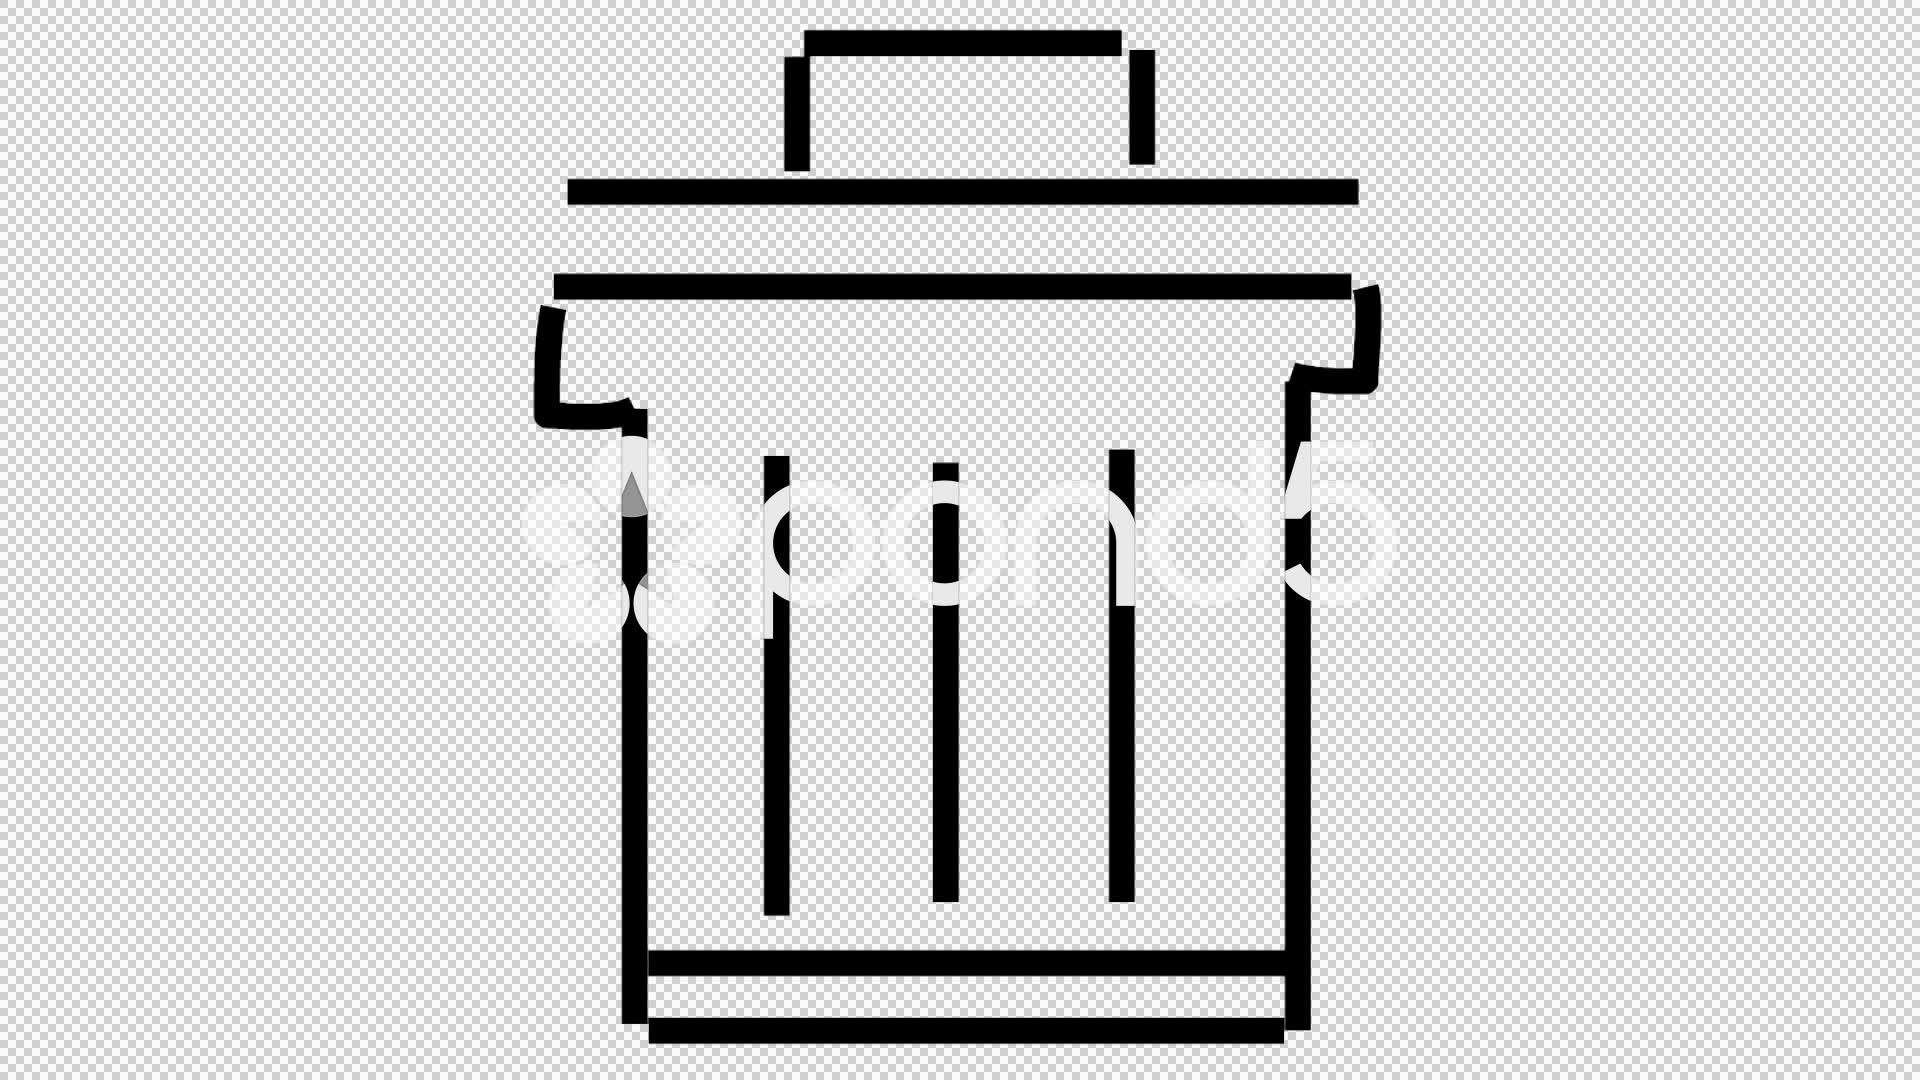 1920x1080 Trash Bin Dustbin Line Drawing Illustration Animation